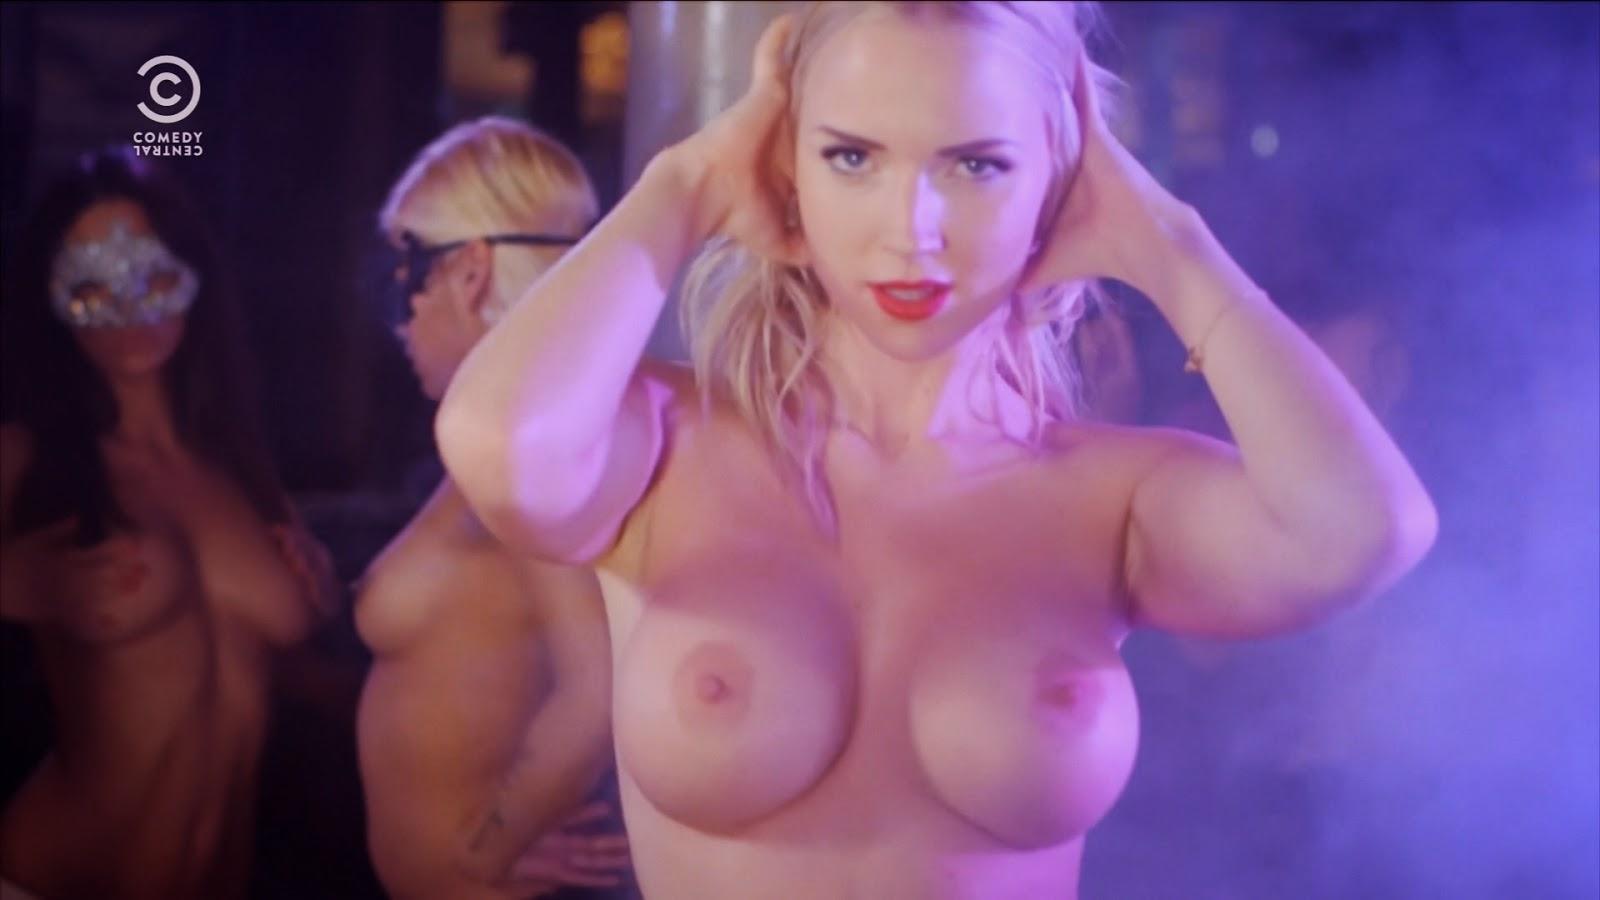 Ancilla Van De Leest Porn ancilla porn | www.freee-porns